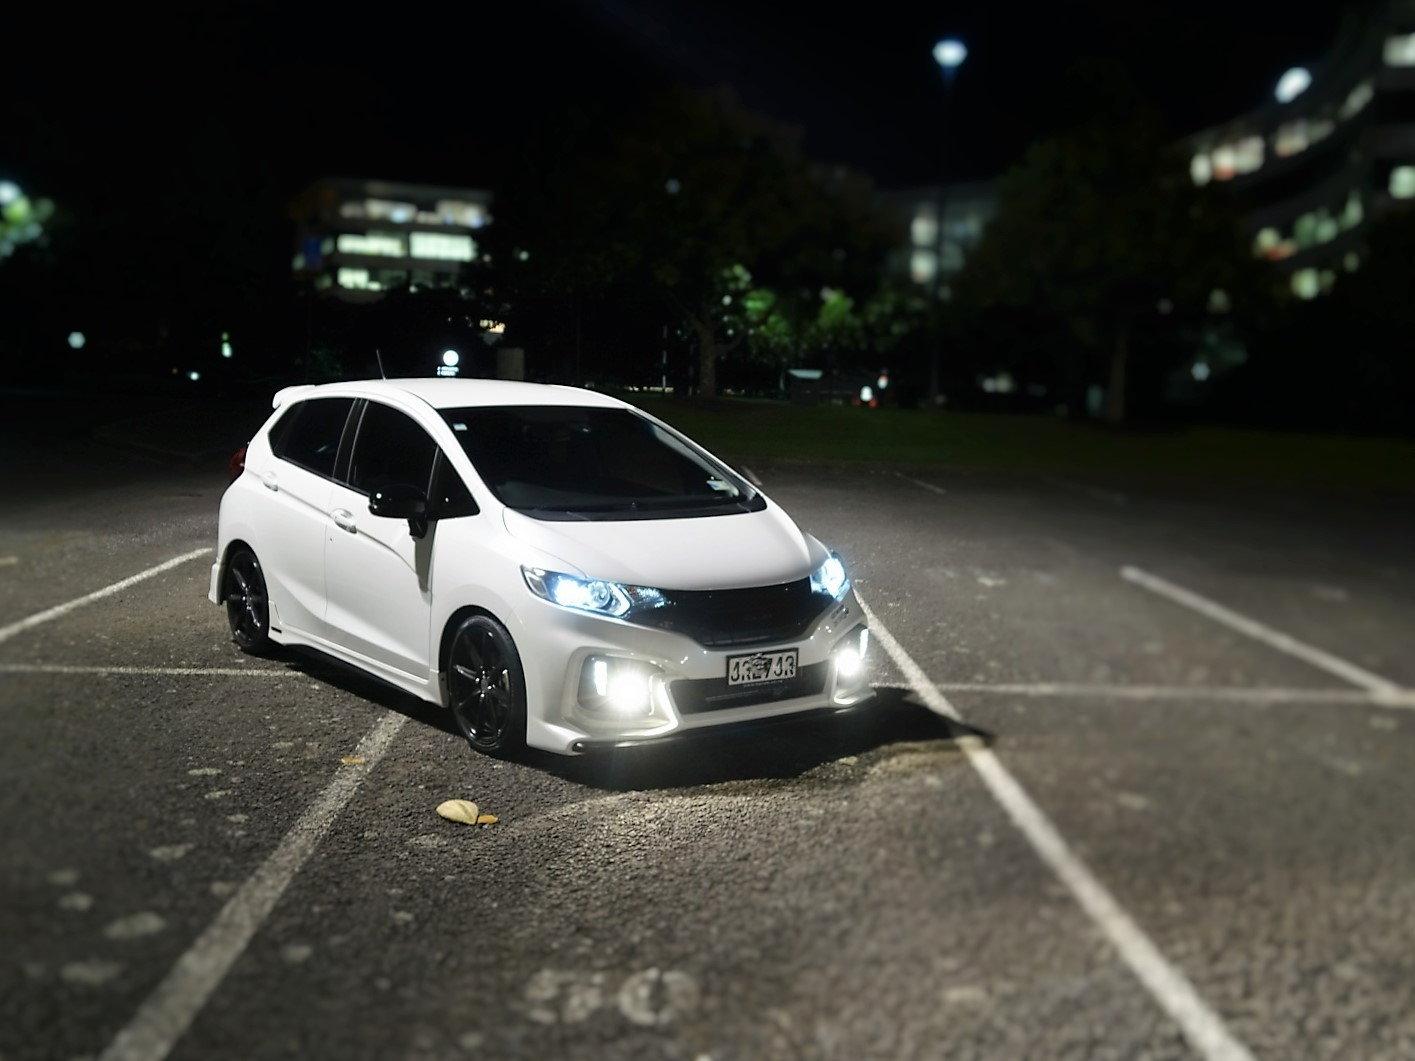 2016 gk5 mugen cvt - Unofficial Honda FIT Forums